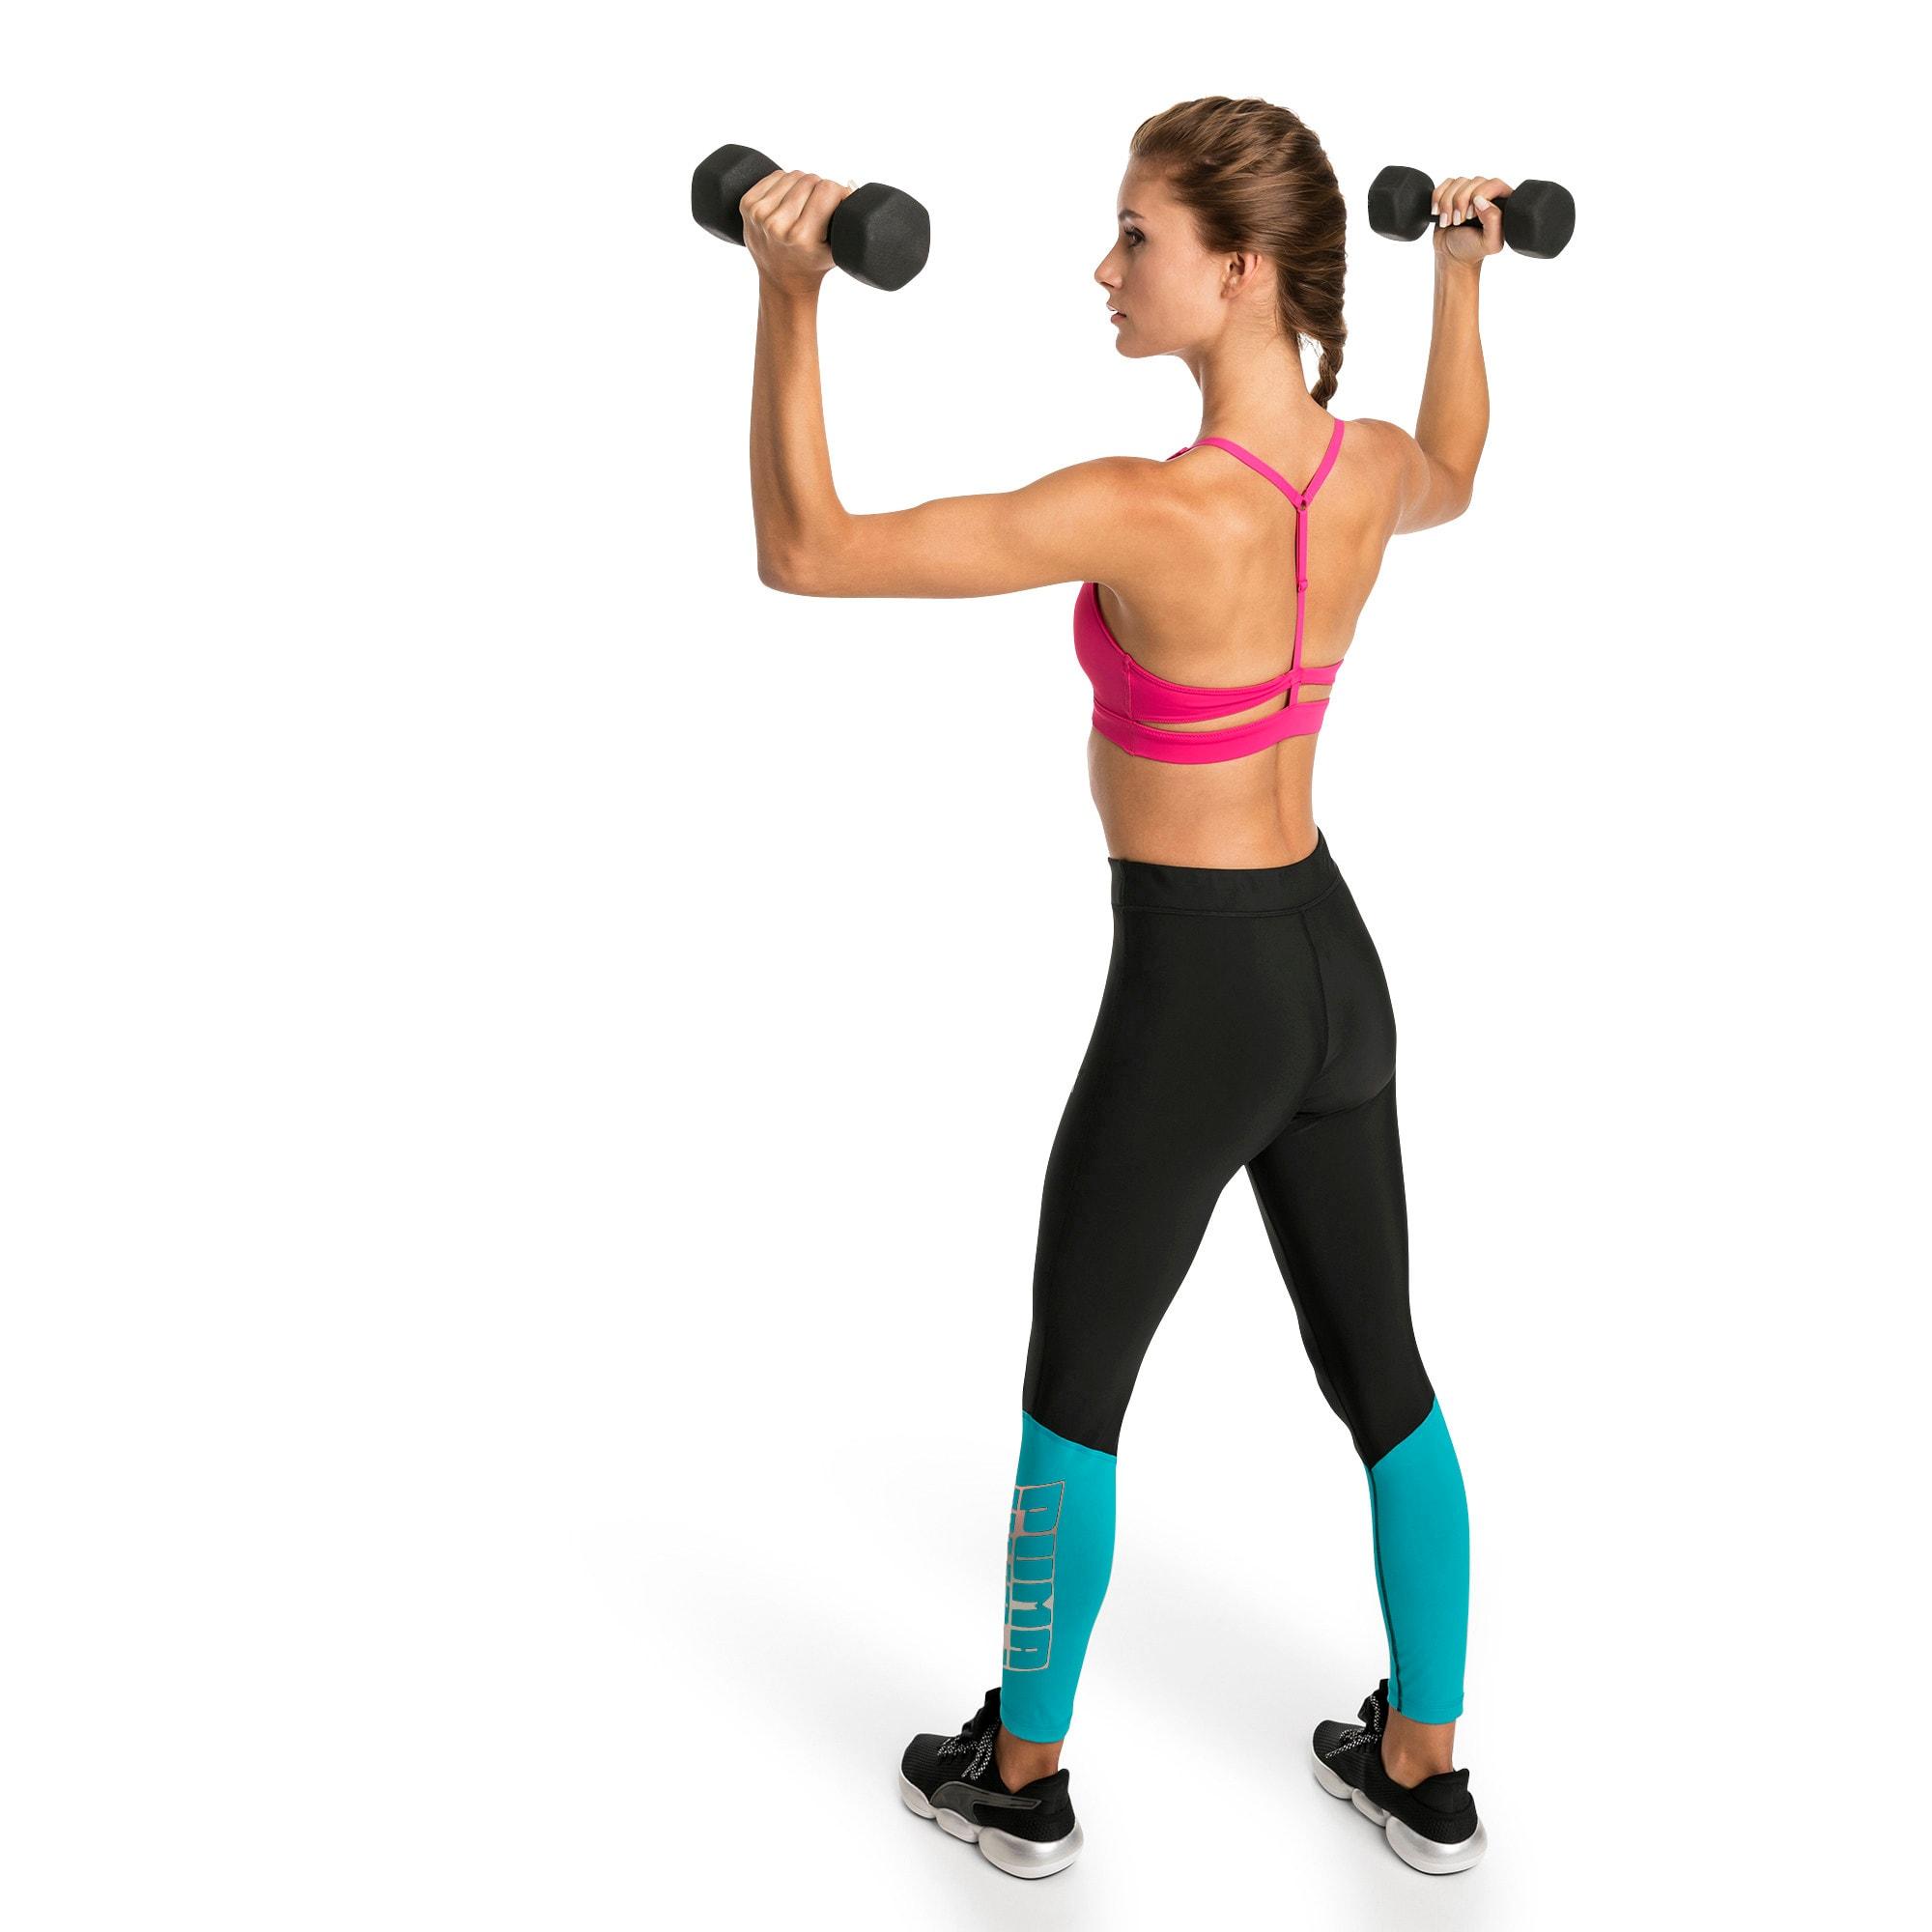 Thumbnail 3 of SpotLite Women's Low Impact Sports Bra, Fuchsia Purple, medium